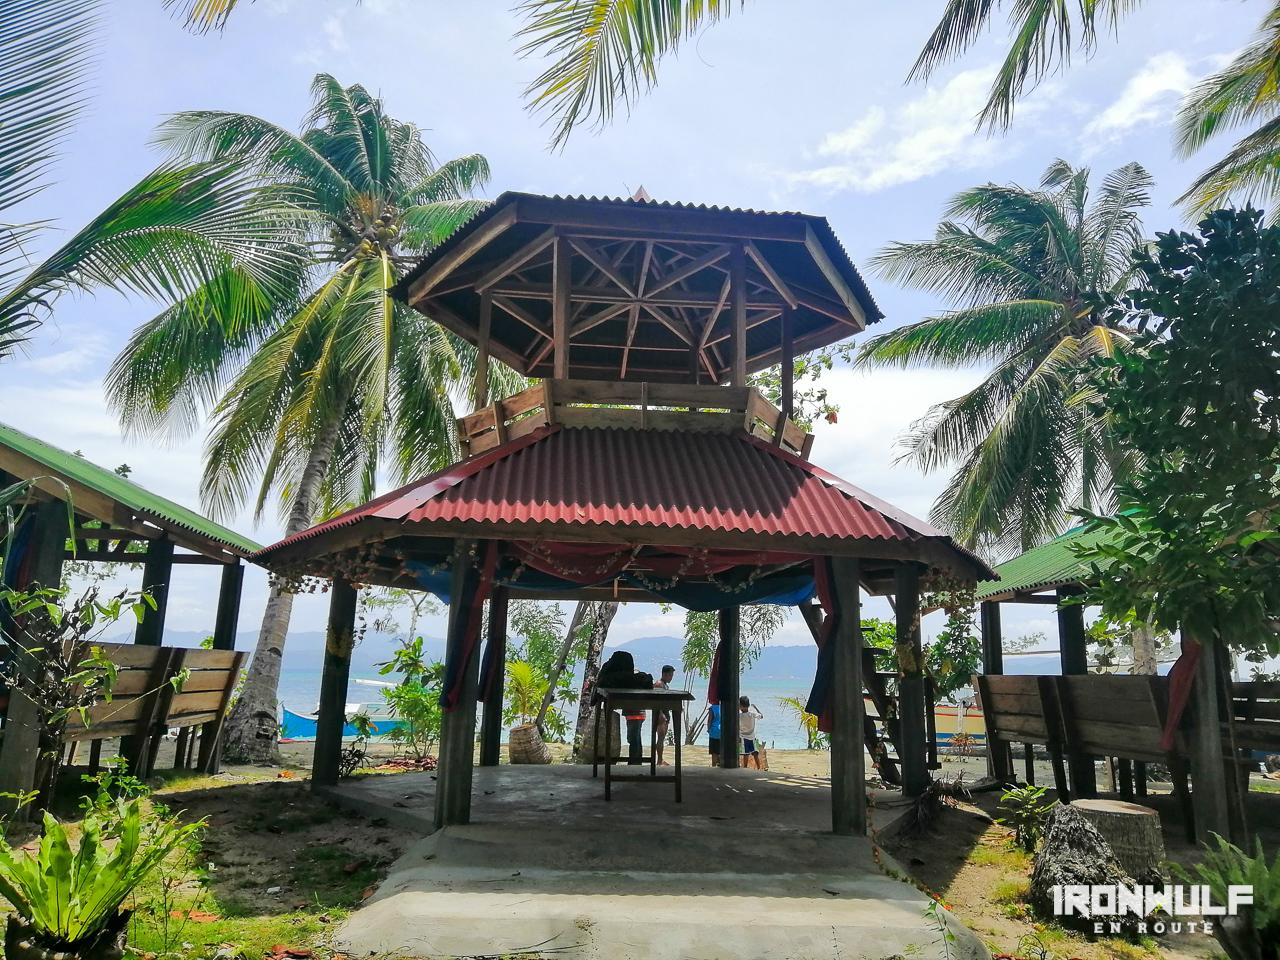 Pavillion at Biray-biray island